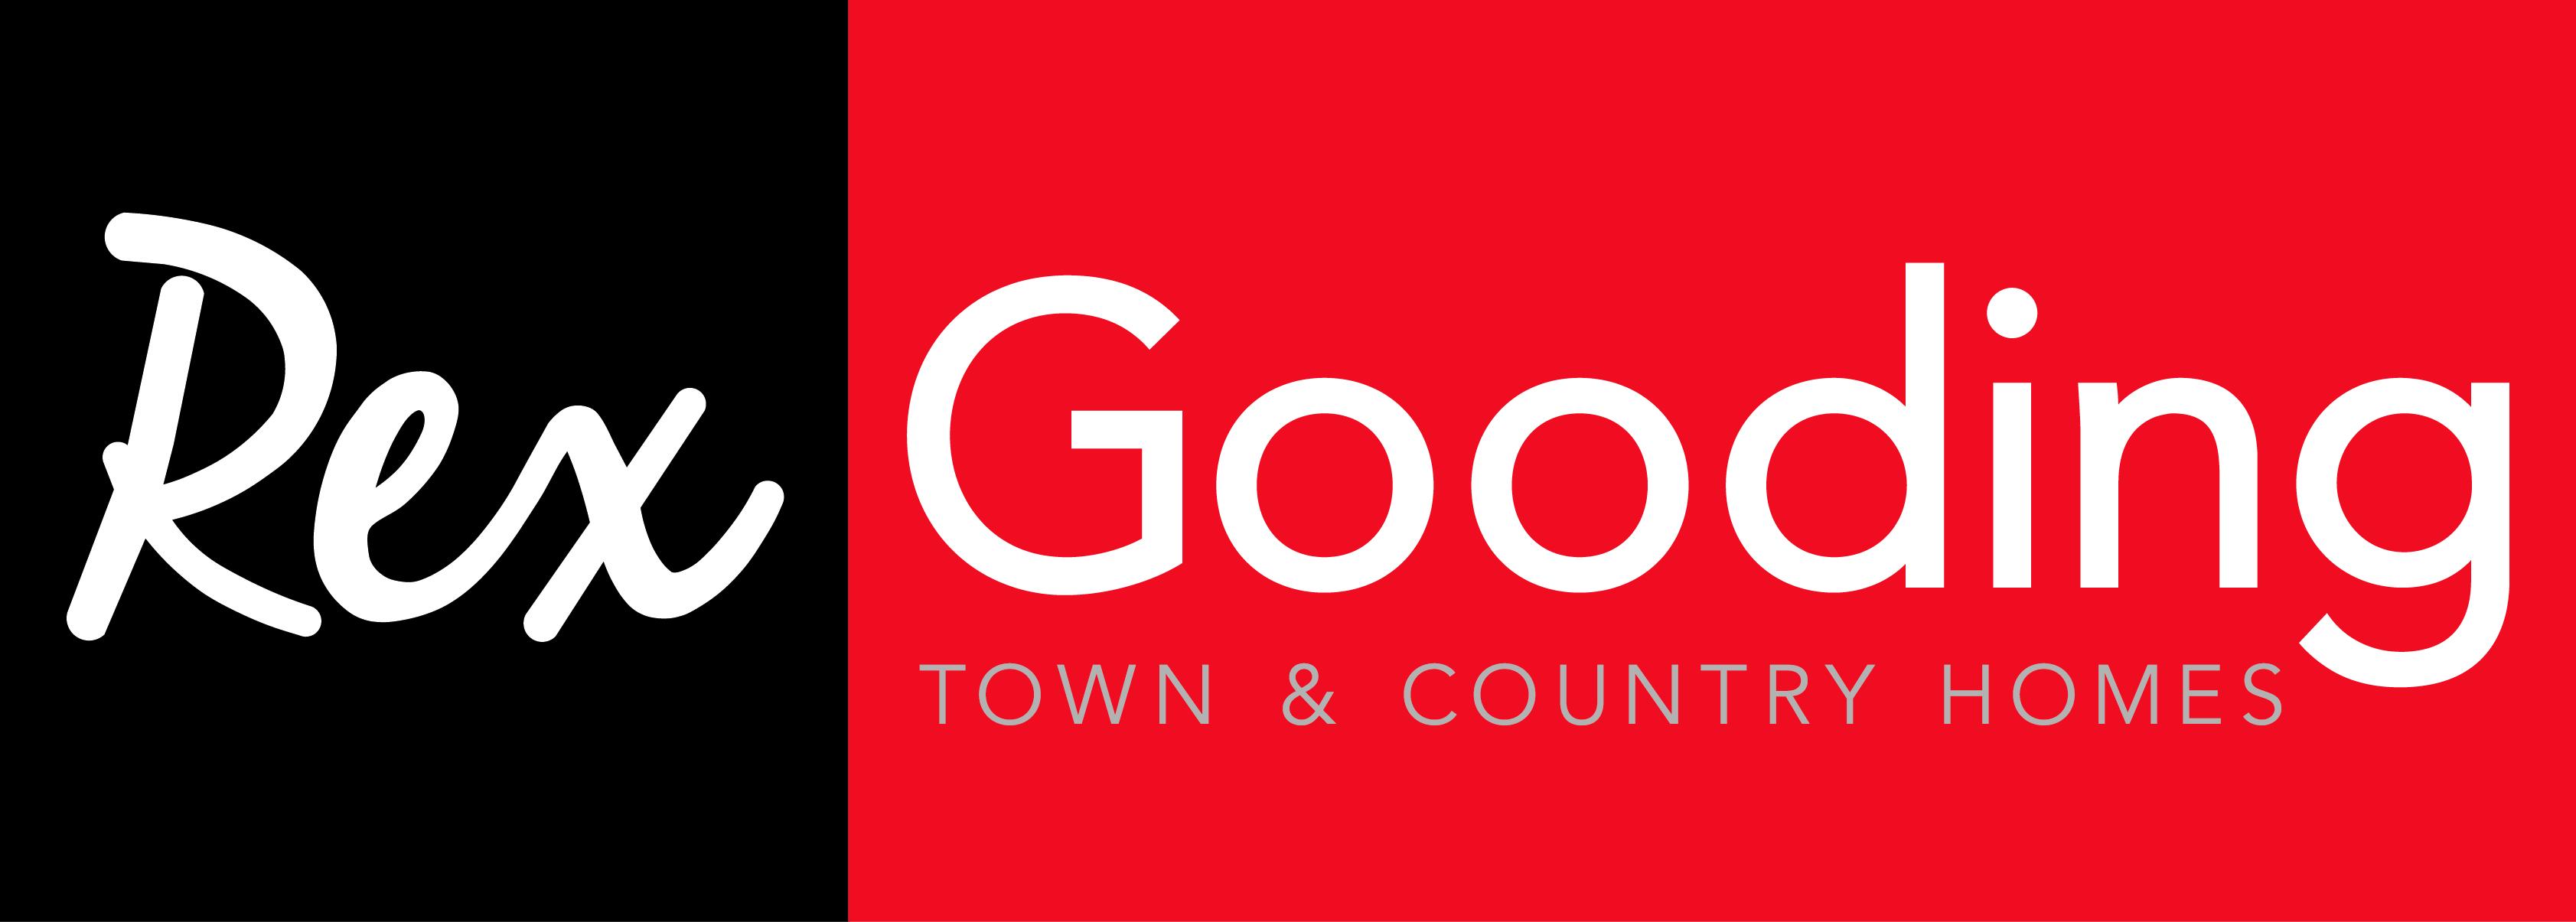 Rex Gooding Logo